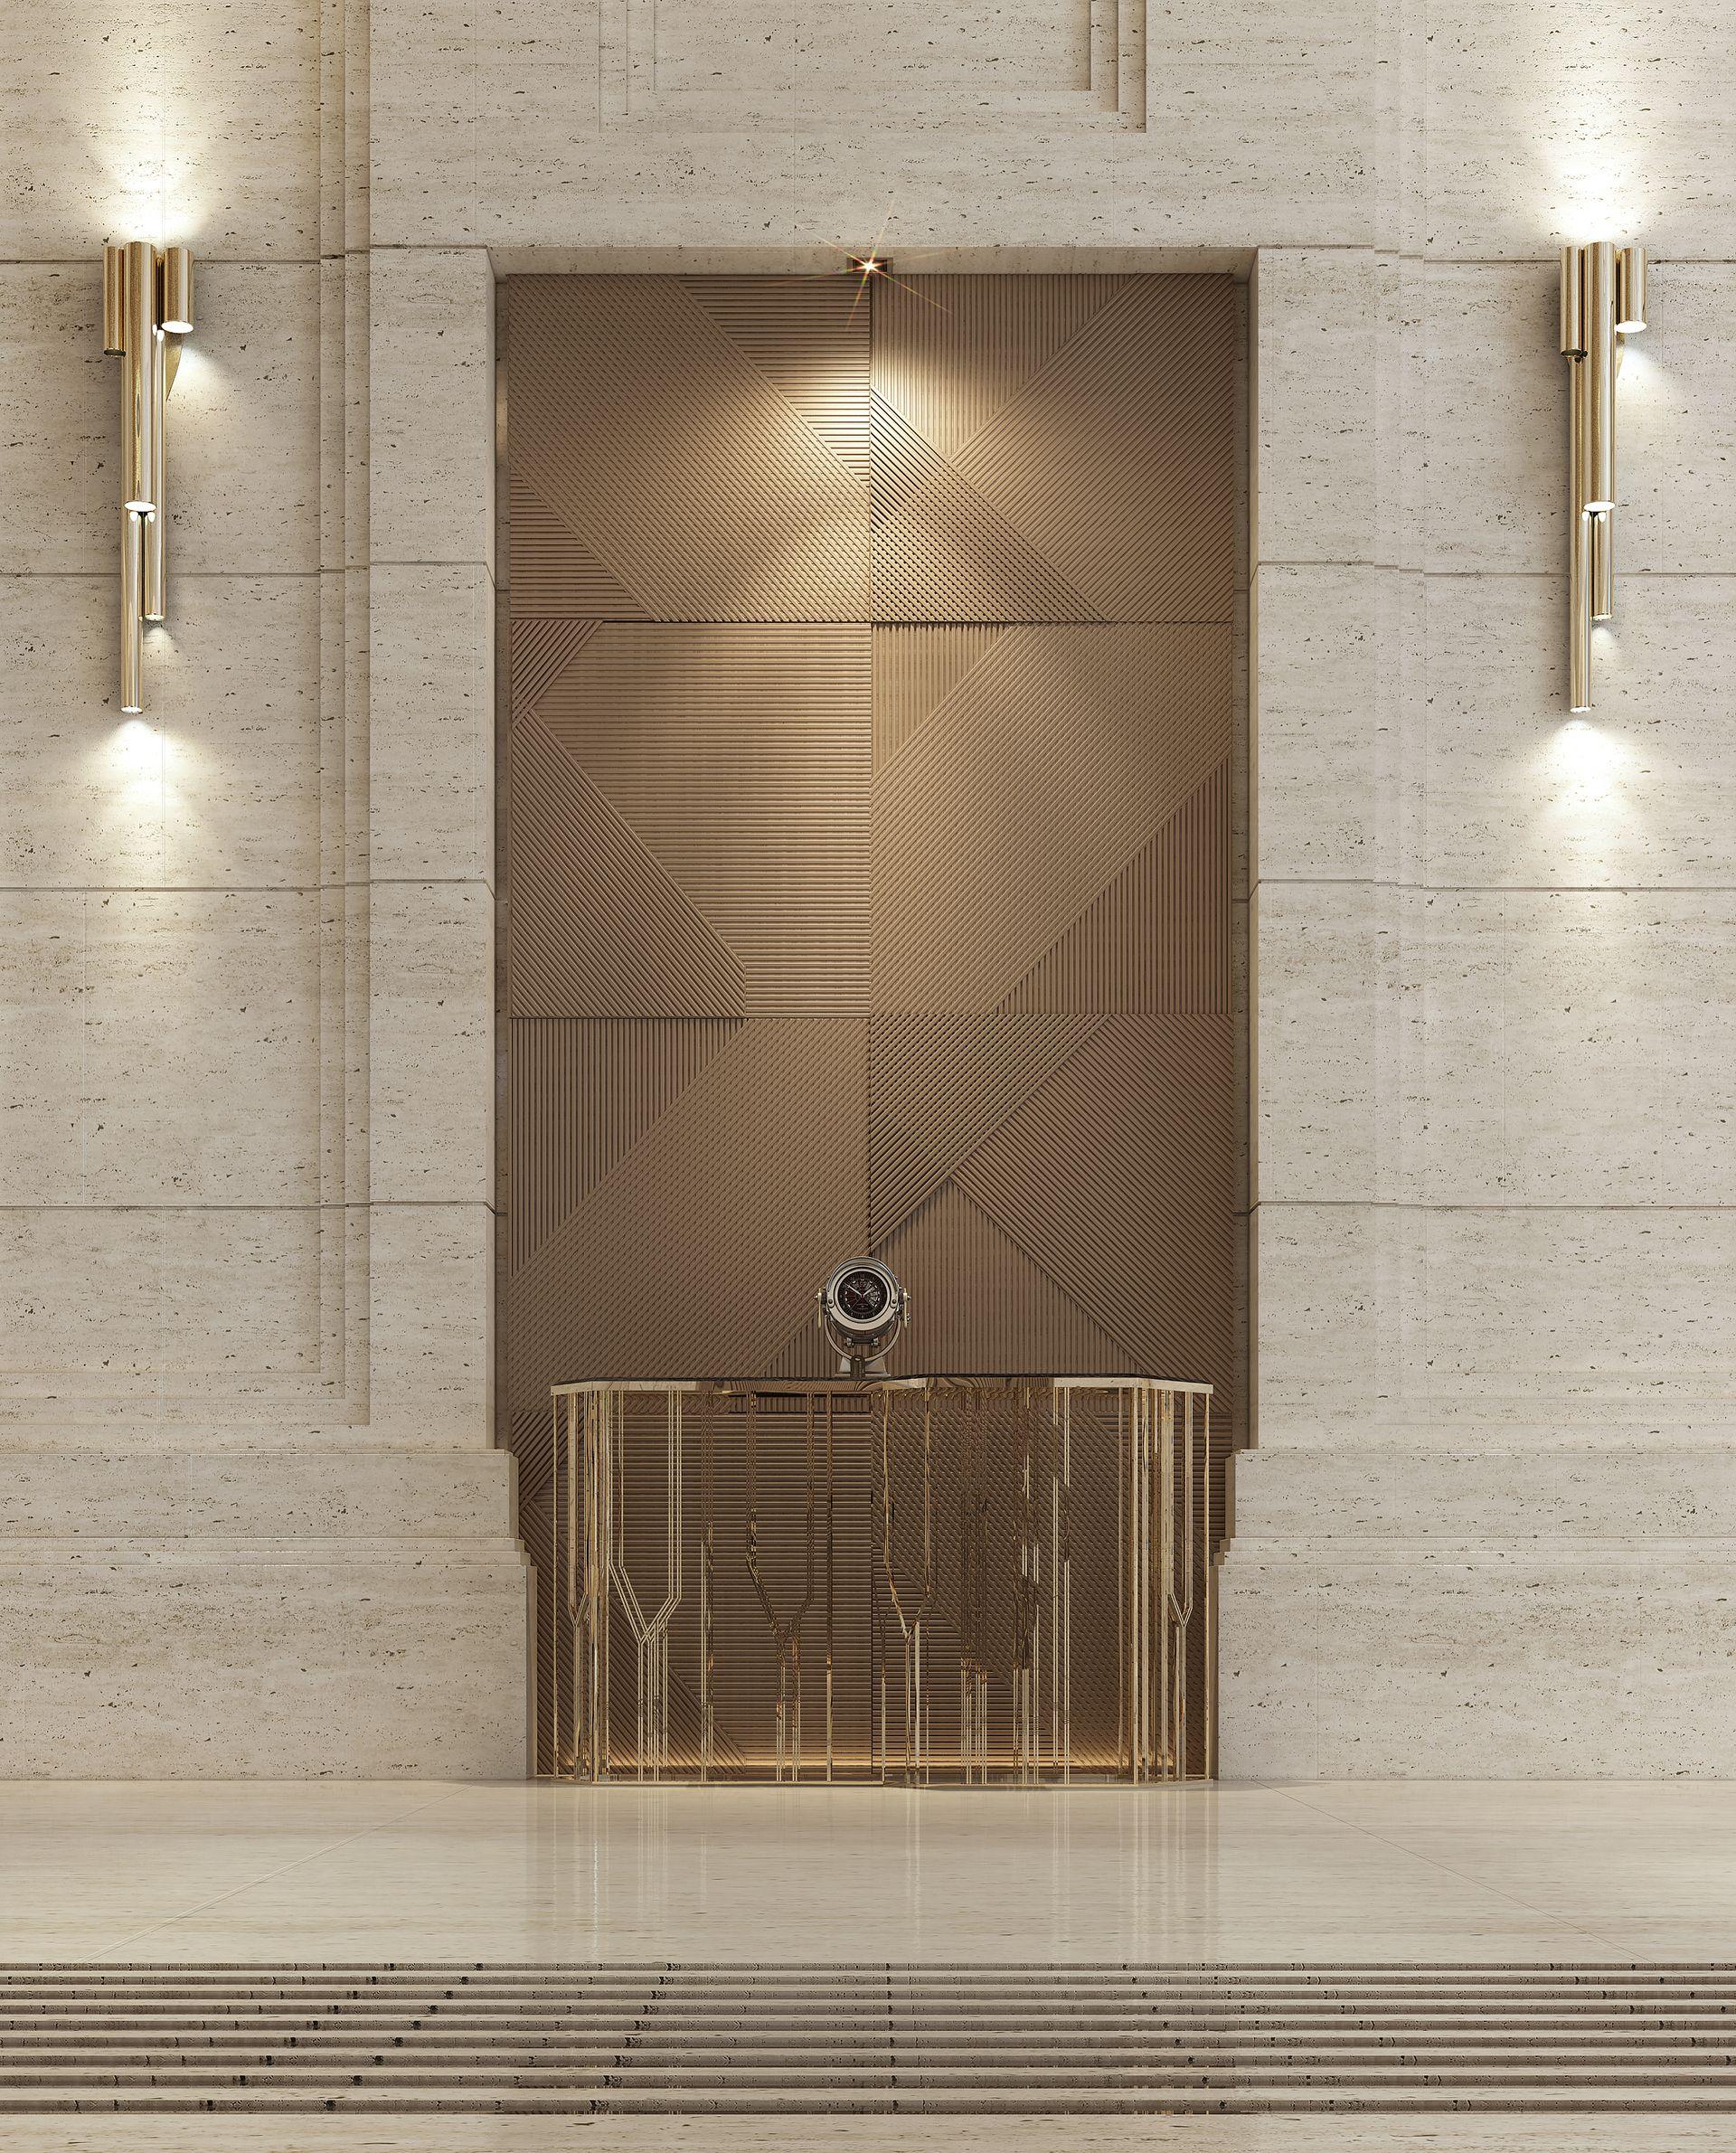 Pin By Adil Taj On Ceiling In 2019: Lobby Interior, Lobby